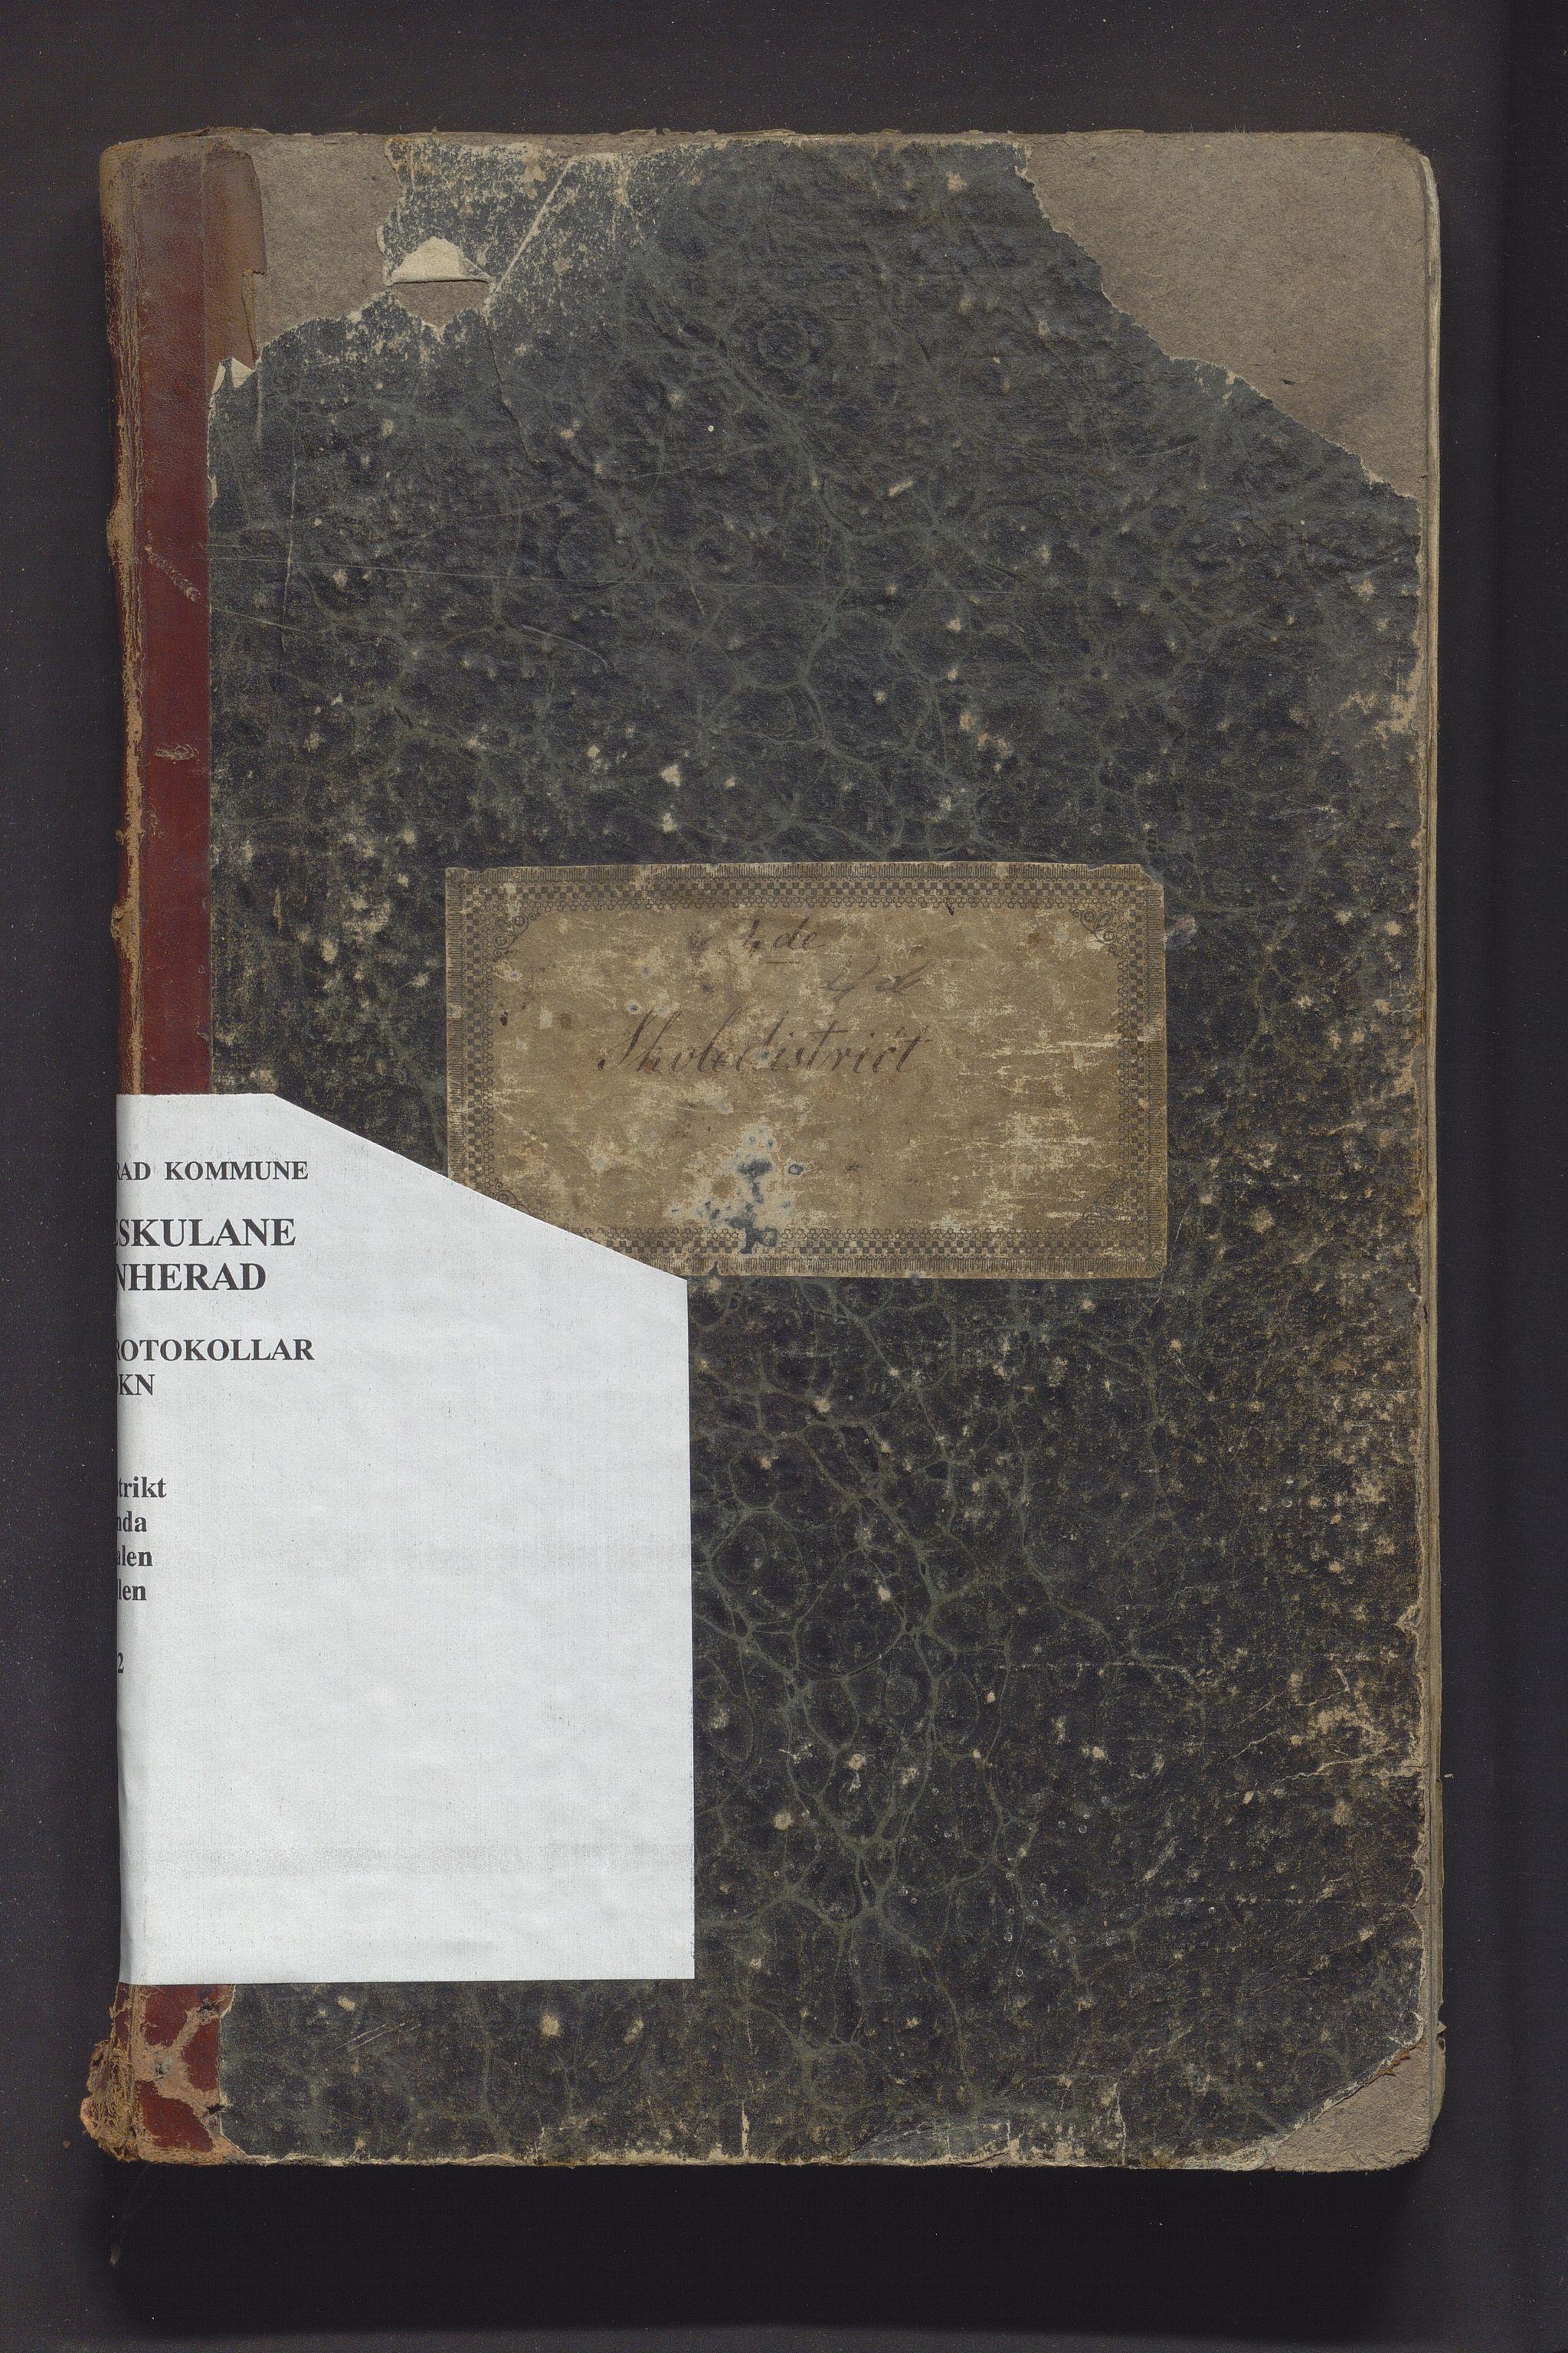 IKAH, Kvinnherad kommune. Barneskulane, F/Fd/L0001: Skuleprotokoll for Årvikstranden, Gjetingsdalen og Nordre Pollen krinsar i 4. skuledistrikt , 1846-1872